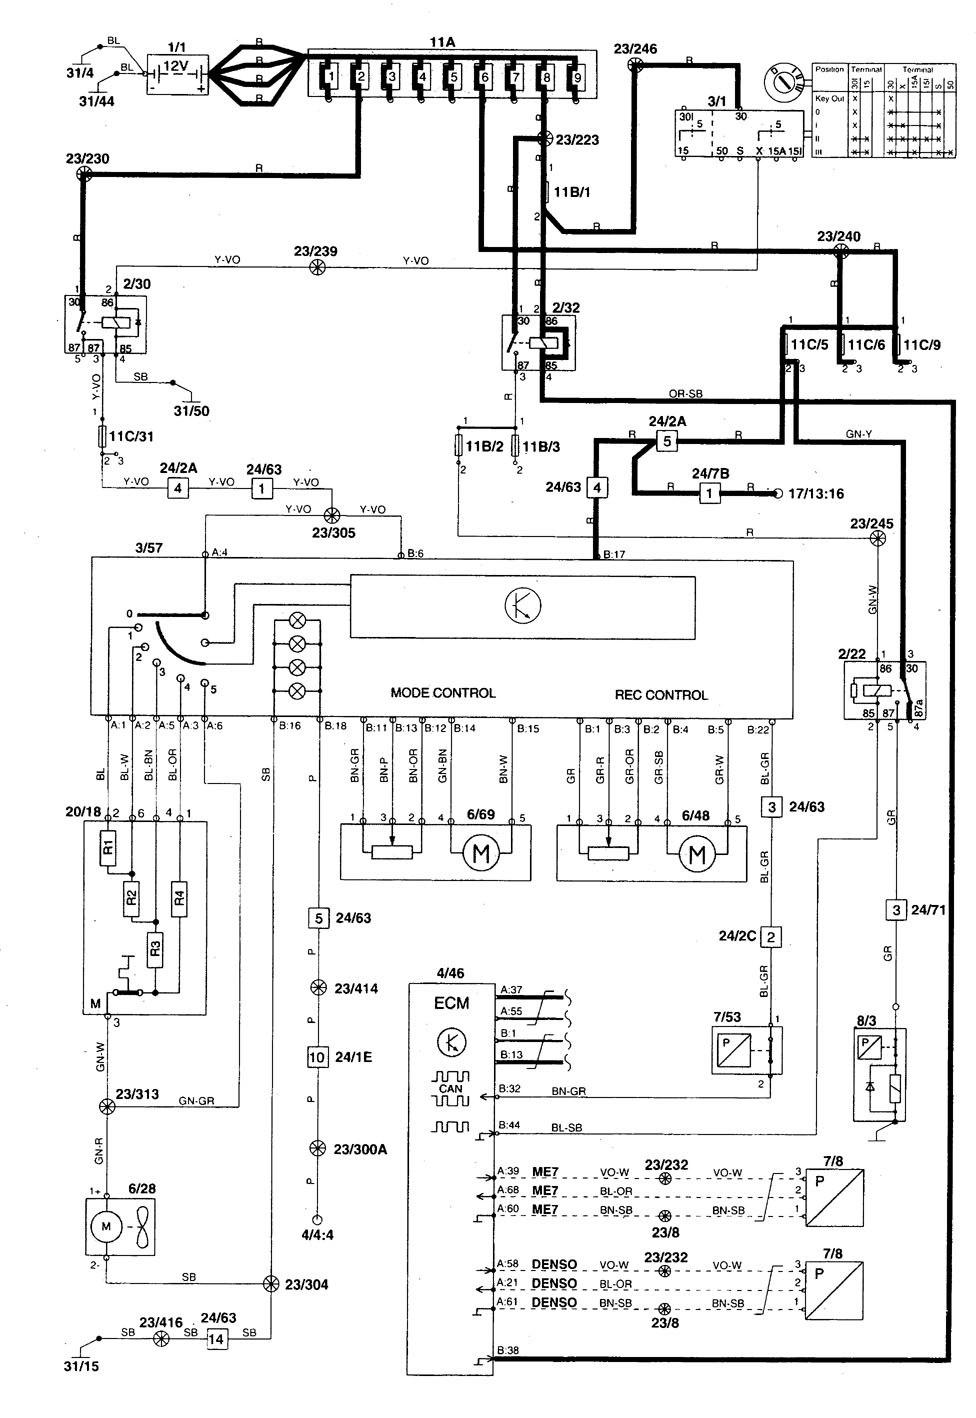 medium resolution of volvo c70 1998 2004 wiring diagrams heater volvo s40 wiring diagram 2004 volvo v70 wiring